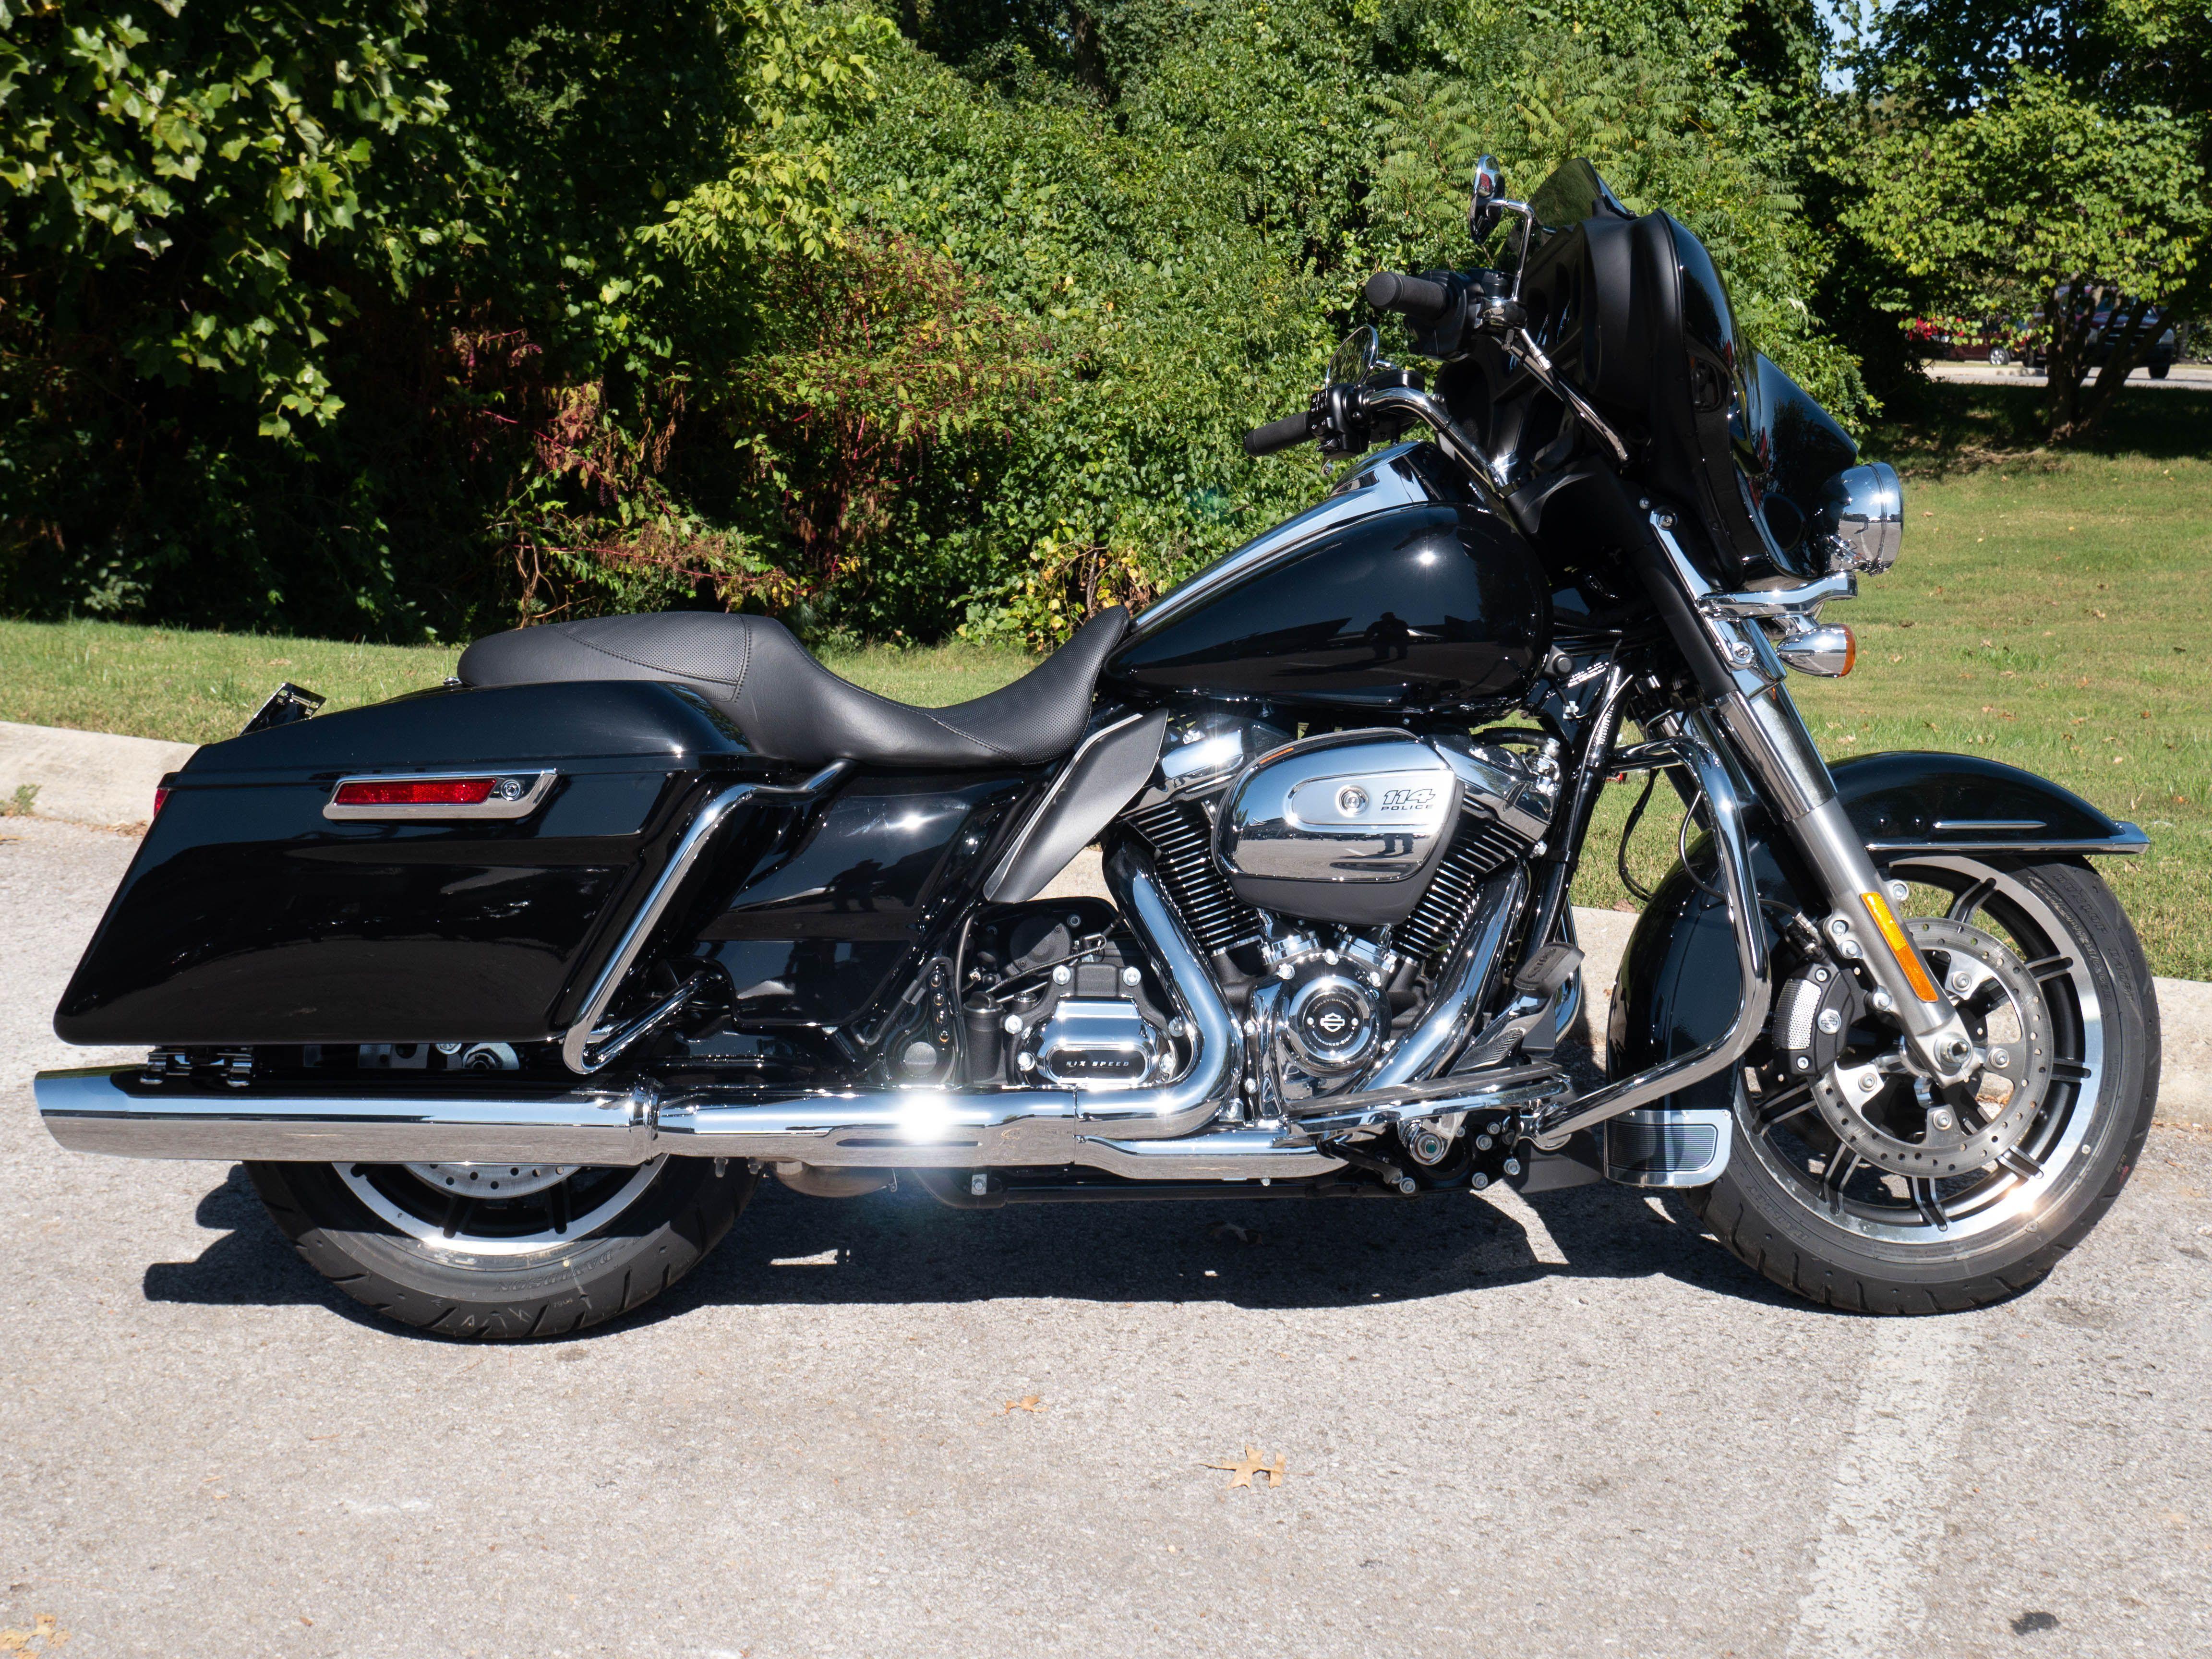 New 2020 Harley-Davidson Electra Glide Police